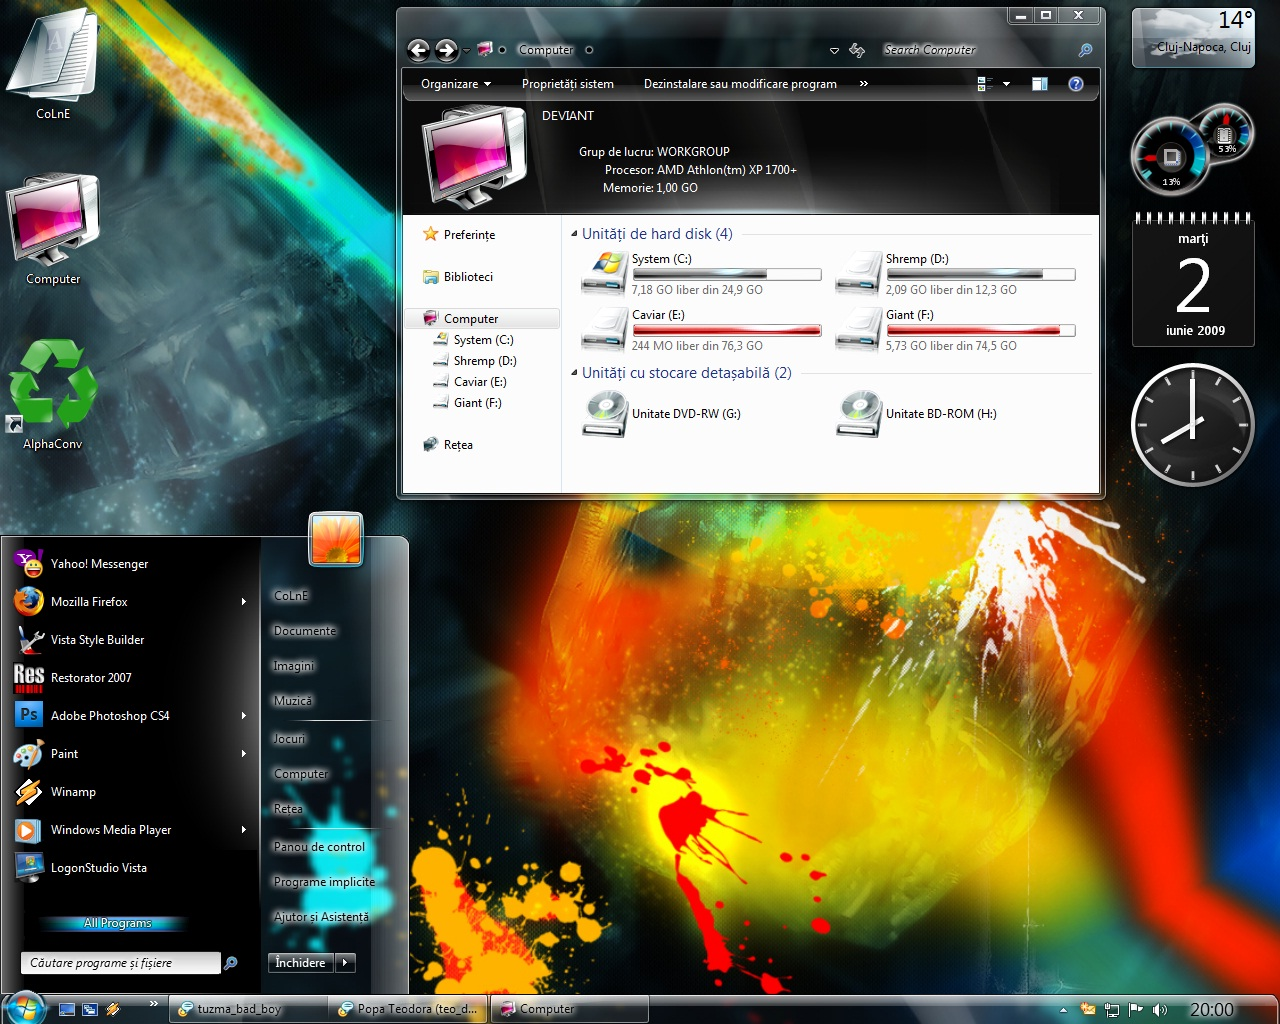 SiCo for Windows 7